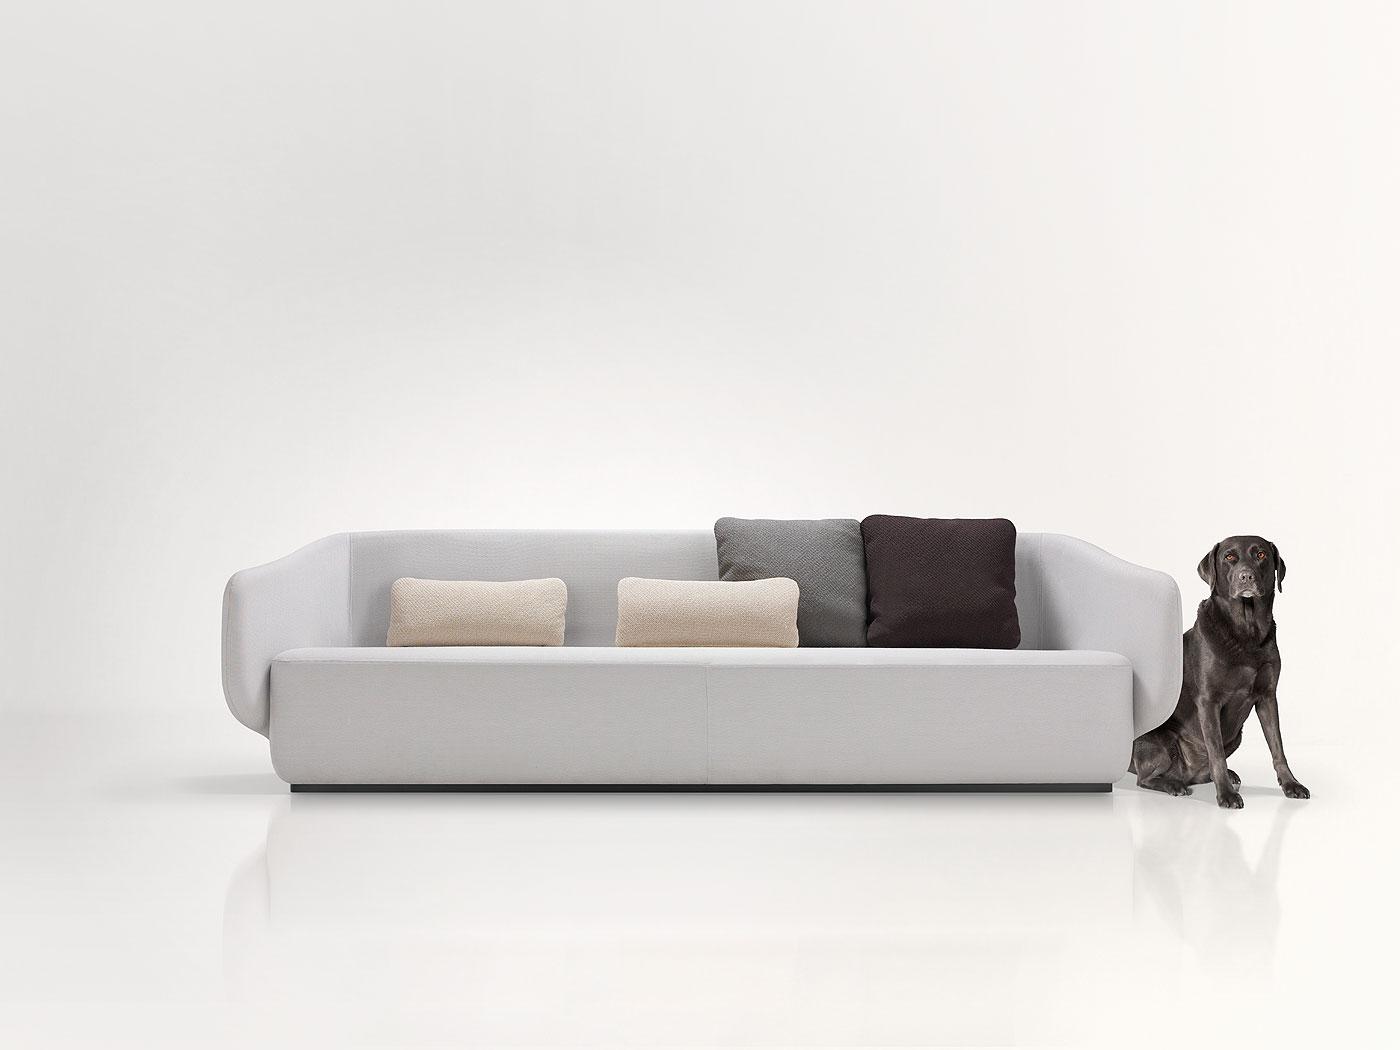 sofa-yon-pau-design-lavernia-cienfuegos (5)